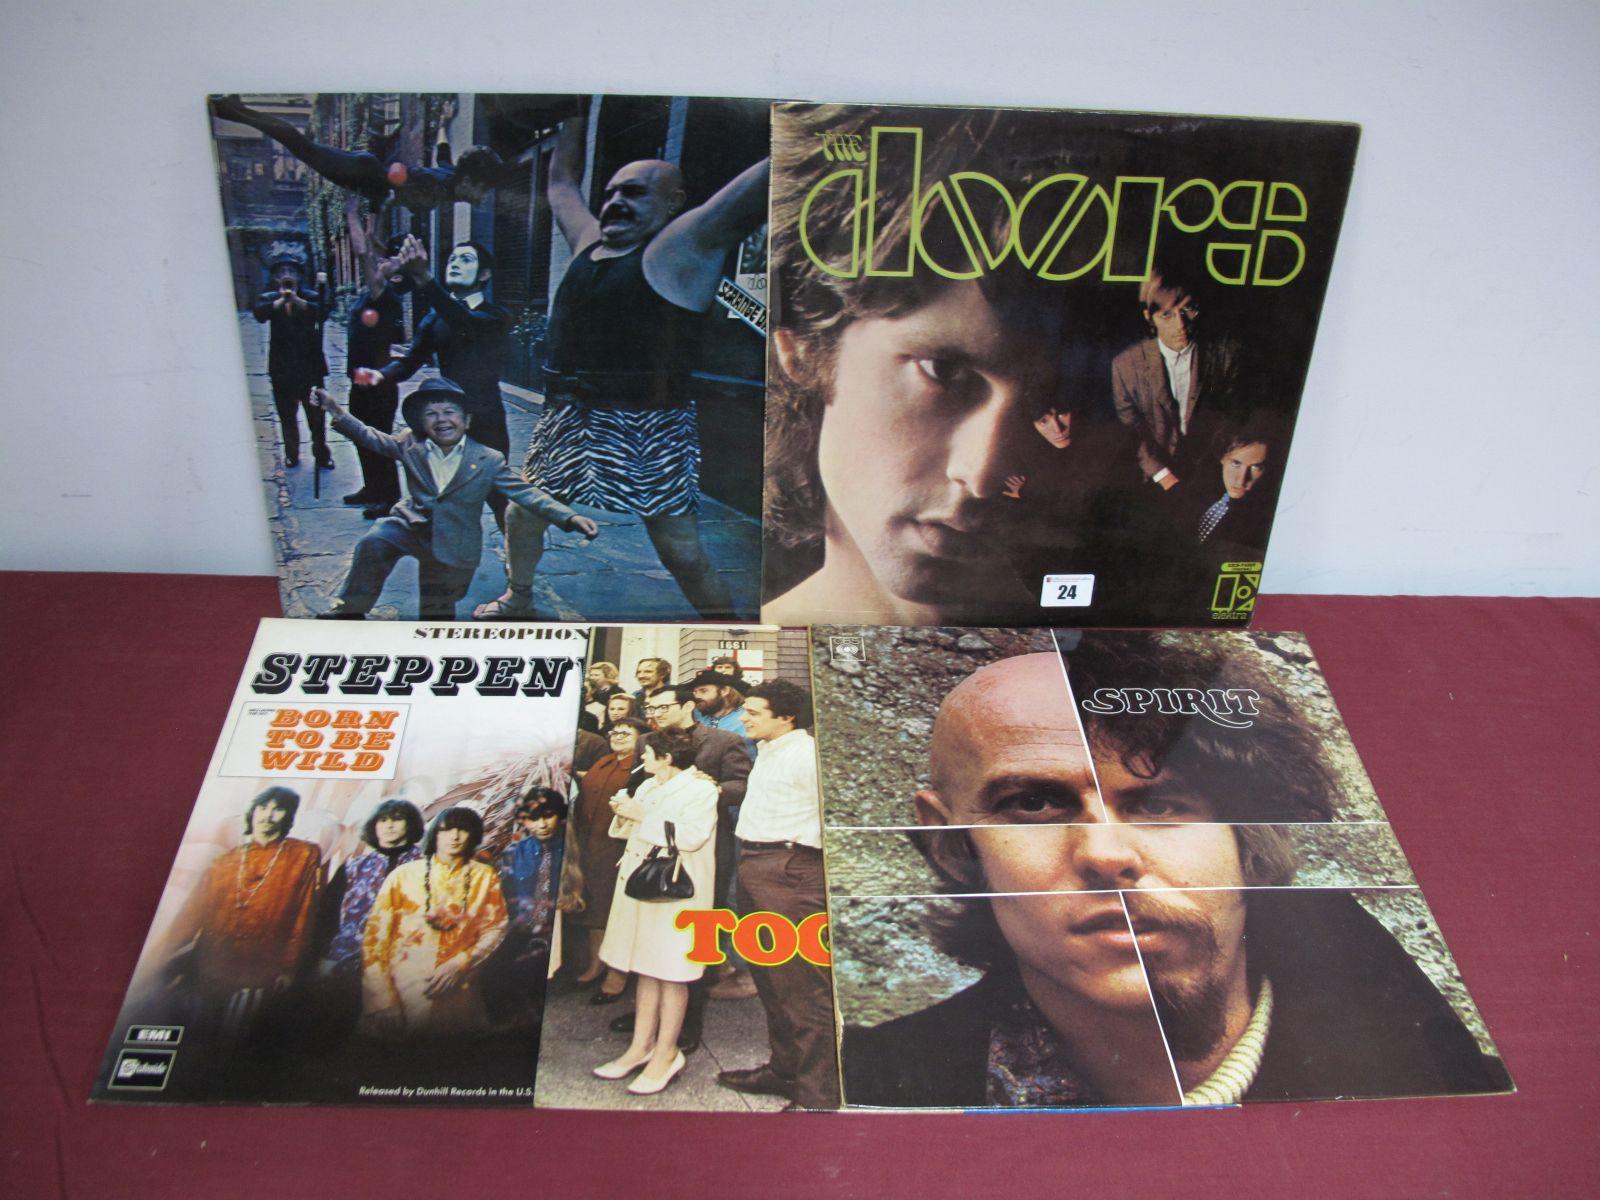 Lot 24 - 60's US Rock LP's - Doors 1st, (stereo EKS-74007, textured orange, Polydor credit, Patent Applied